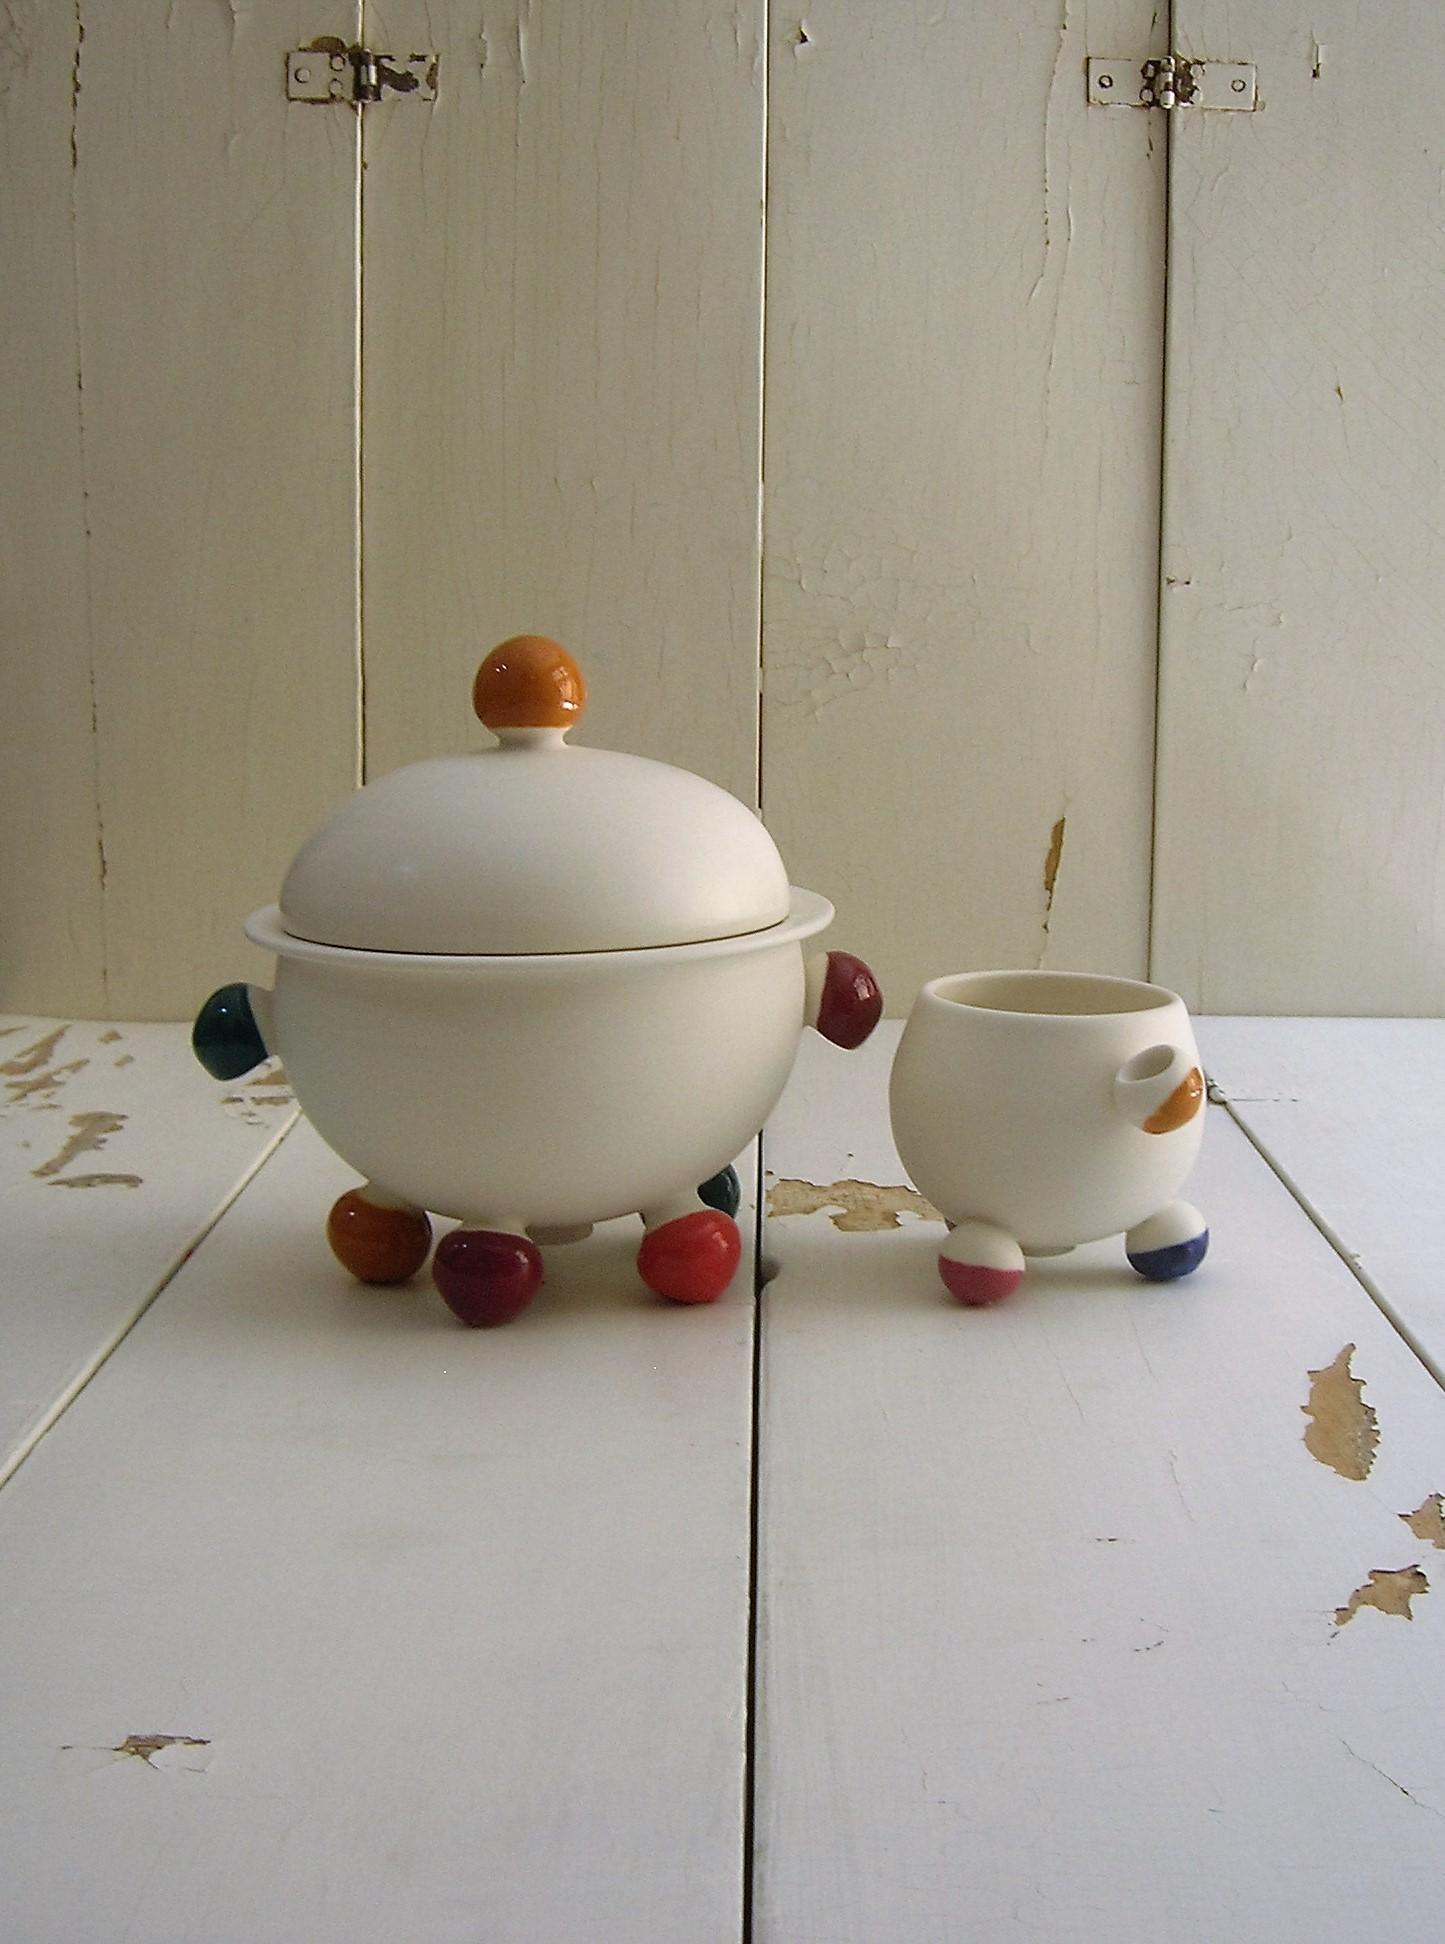 OLIVA contenitori zuppiere teiere zuccheriere lattiere tazze tazzine